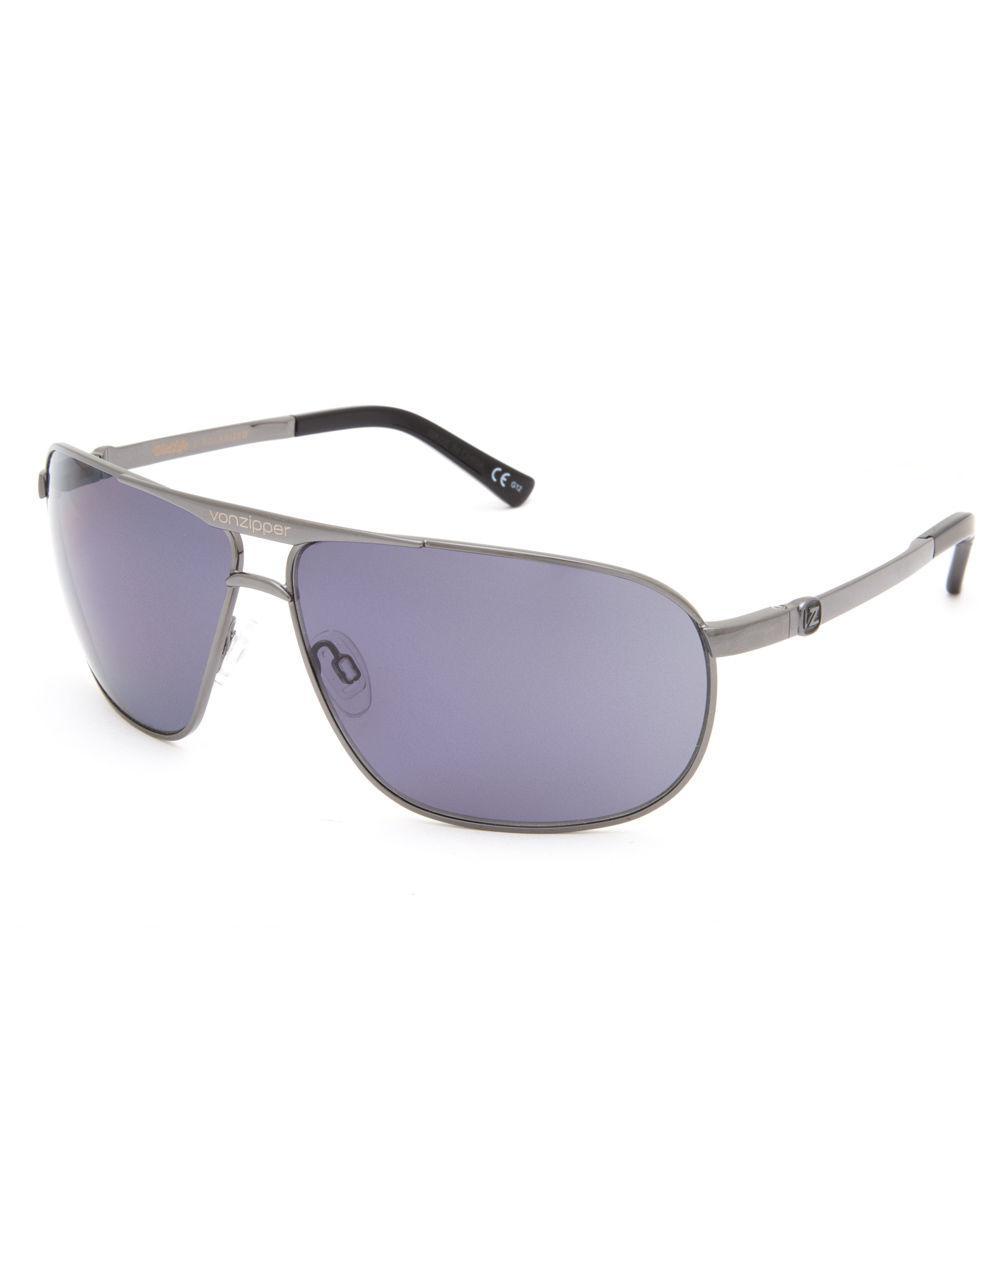 5ea257925e9 Lyst - Von Zipper Skitch Wildlife Polarized Sunglasses for Men